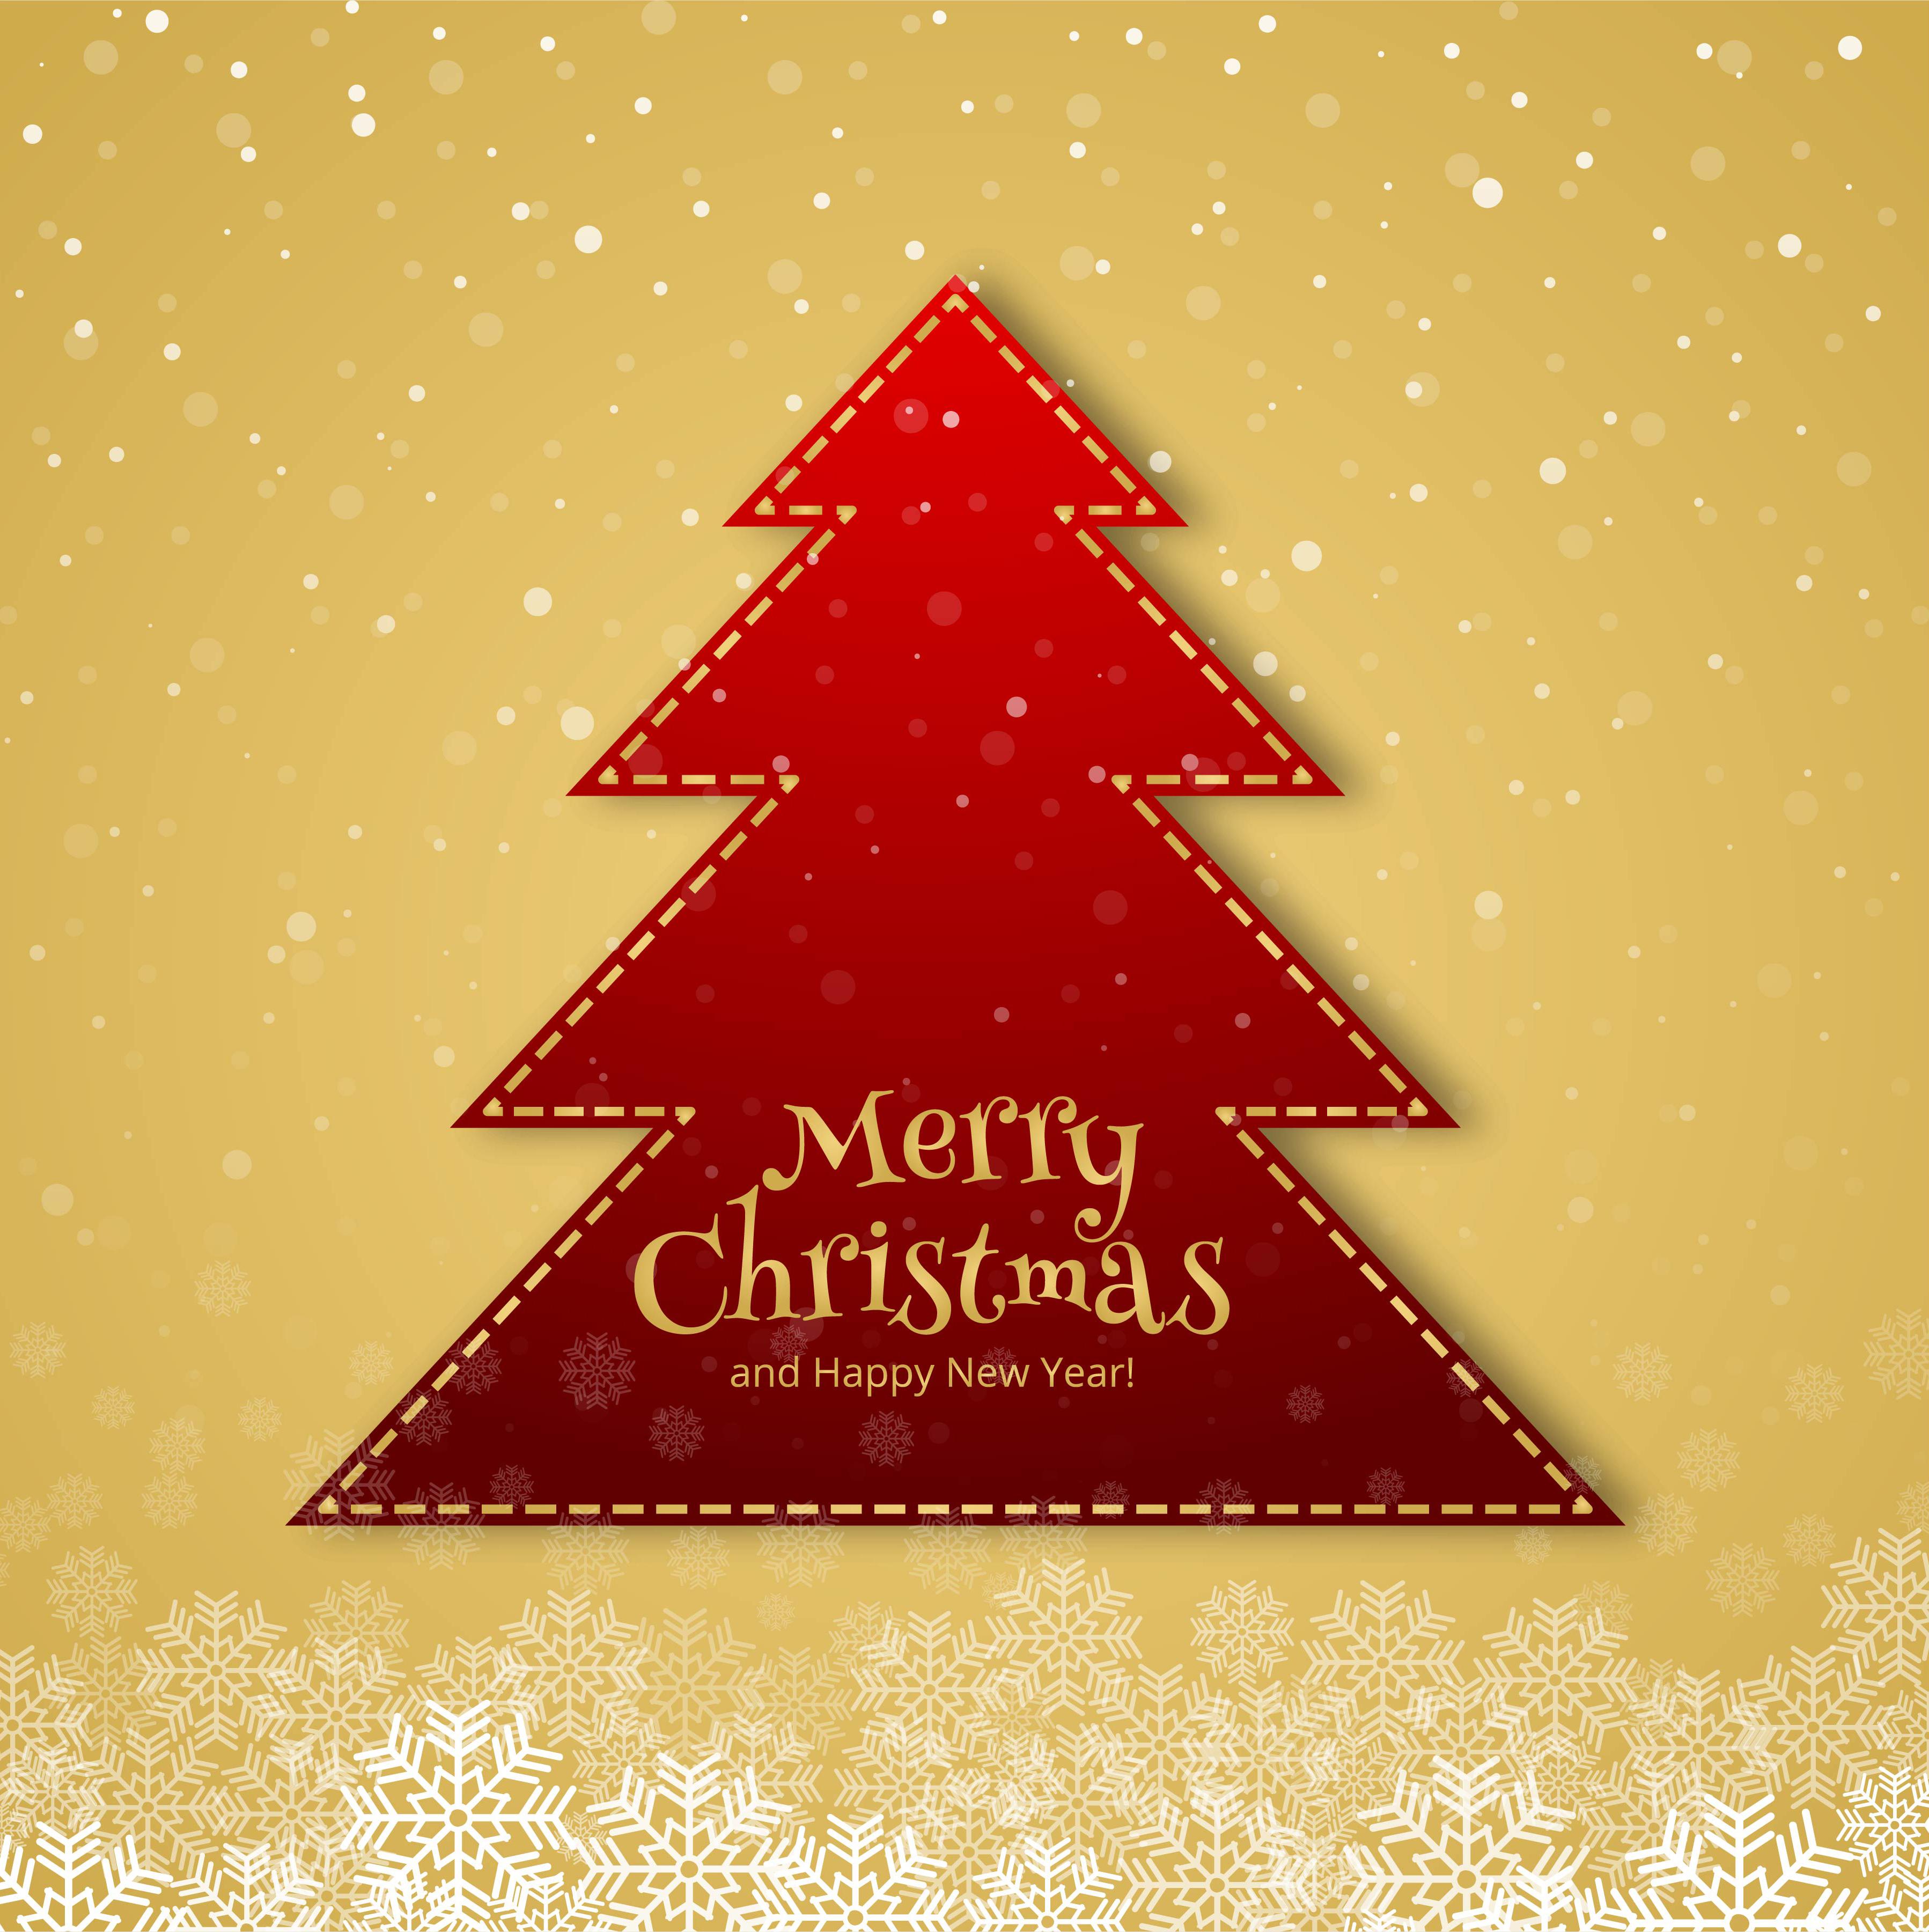 Christmas Tree Merry Christmas: Beautiful Merry Christmas Tree Celebration Card Background